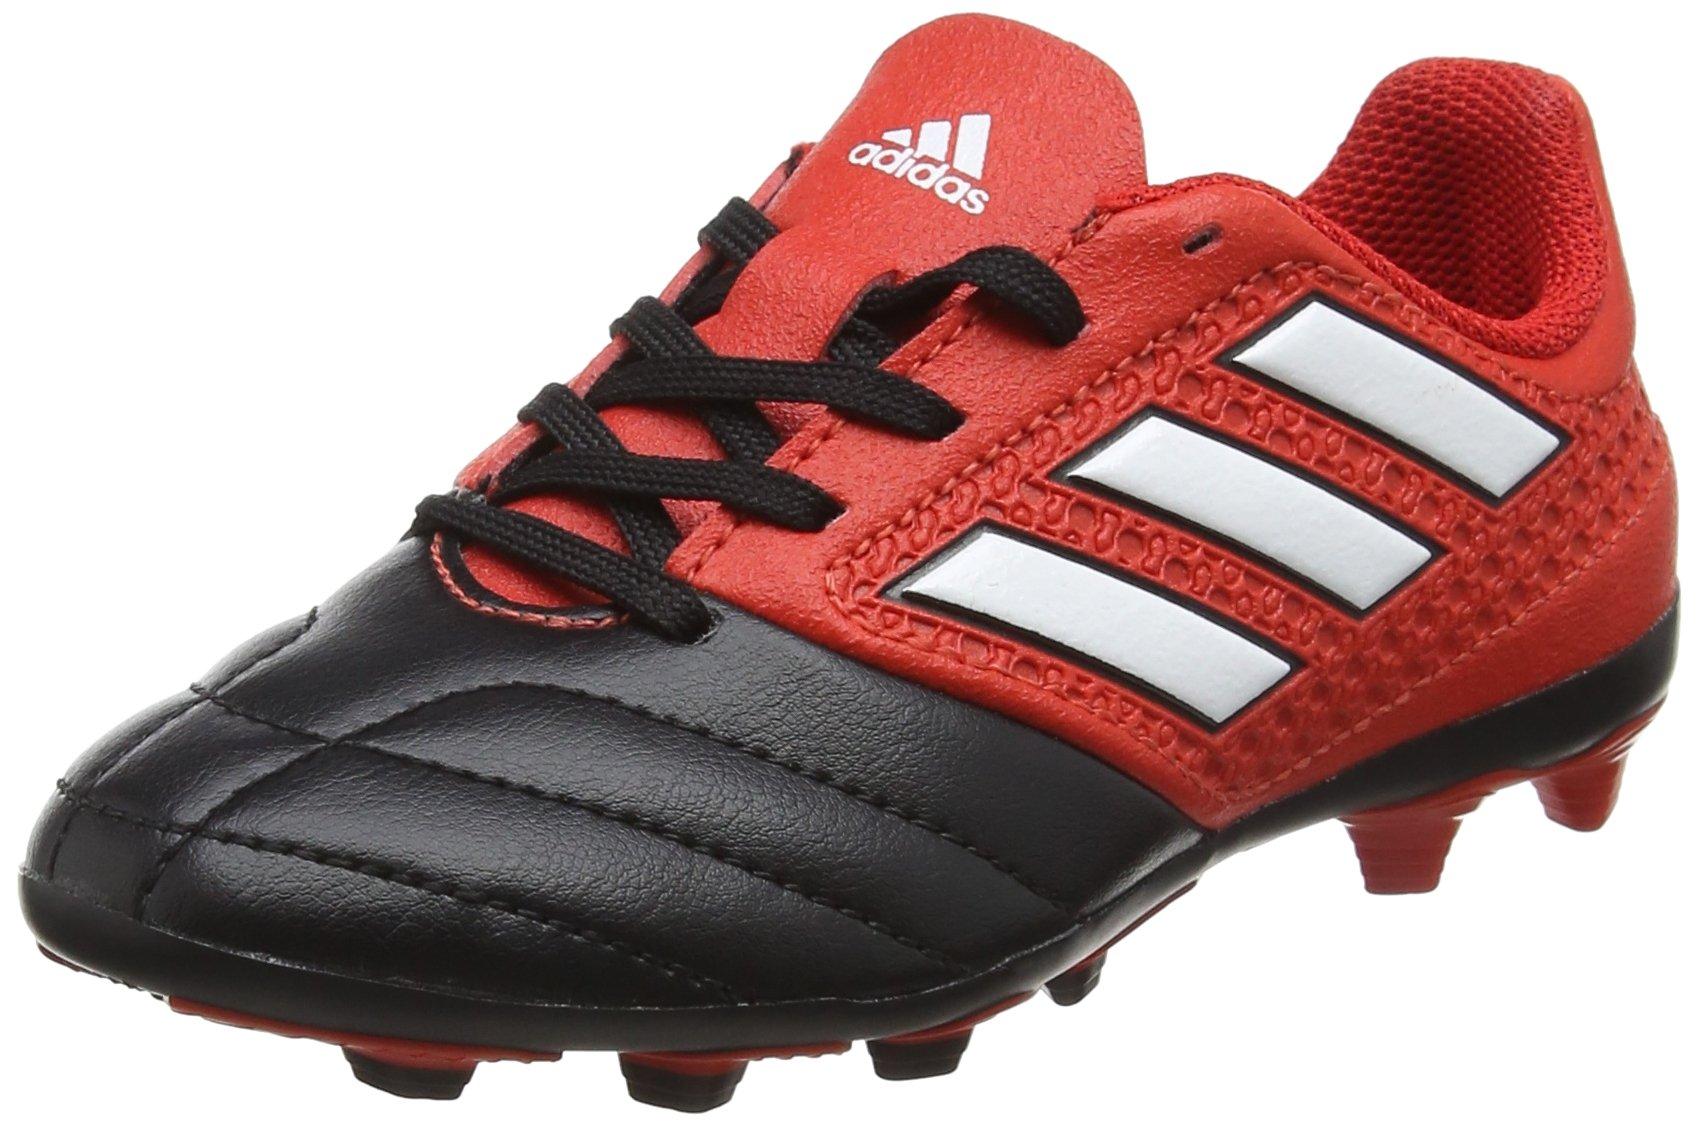 4 Adidas J Image Ace Scarpe 17 – Bambini Product Unisex Fxg Da Calcio qrOrEx1Hw